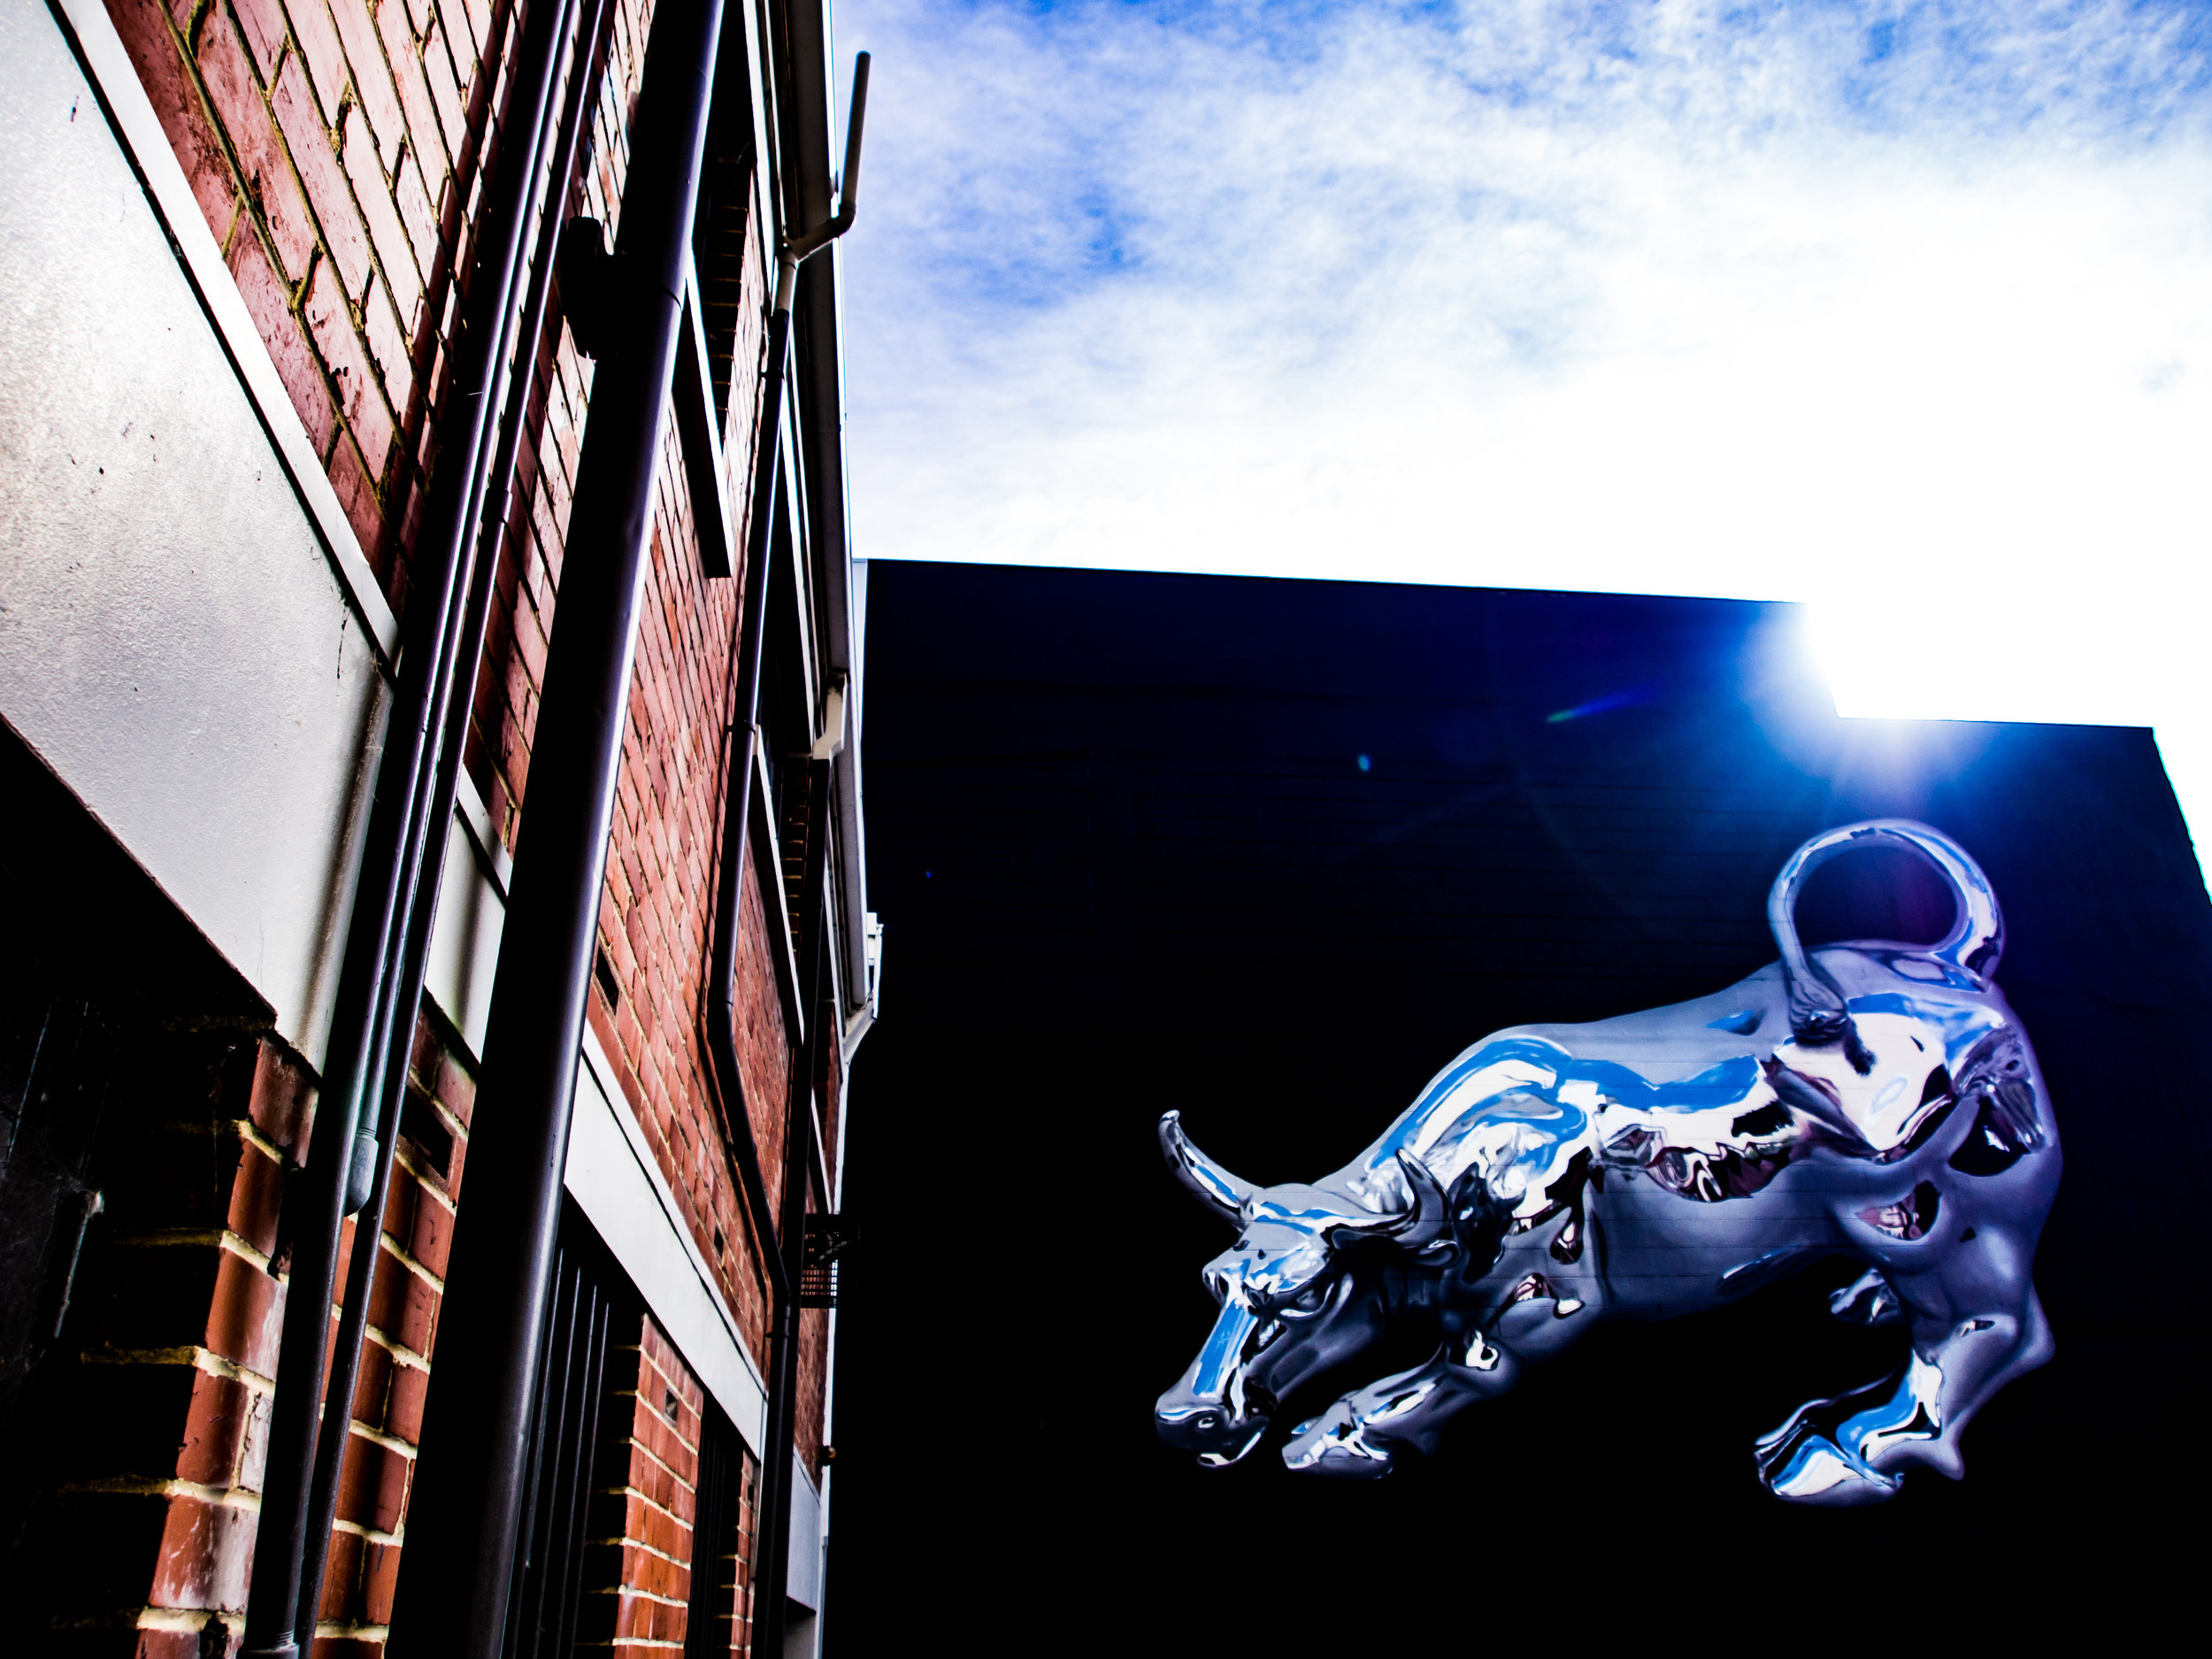 Bikismo street art Dunedin photography